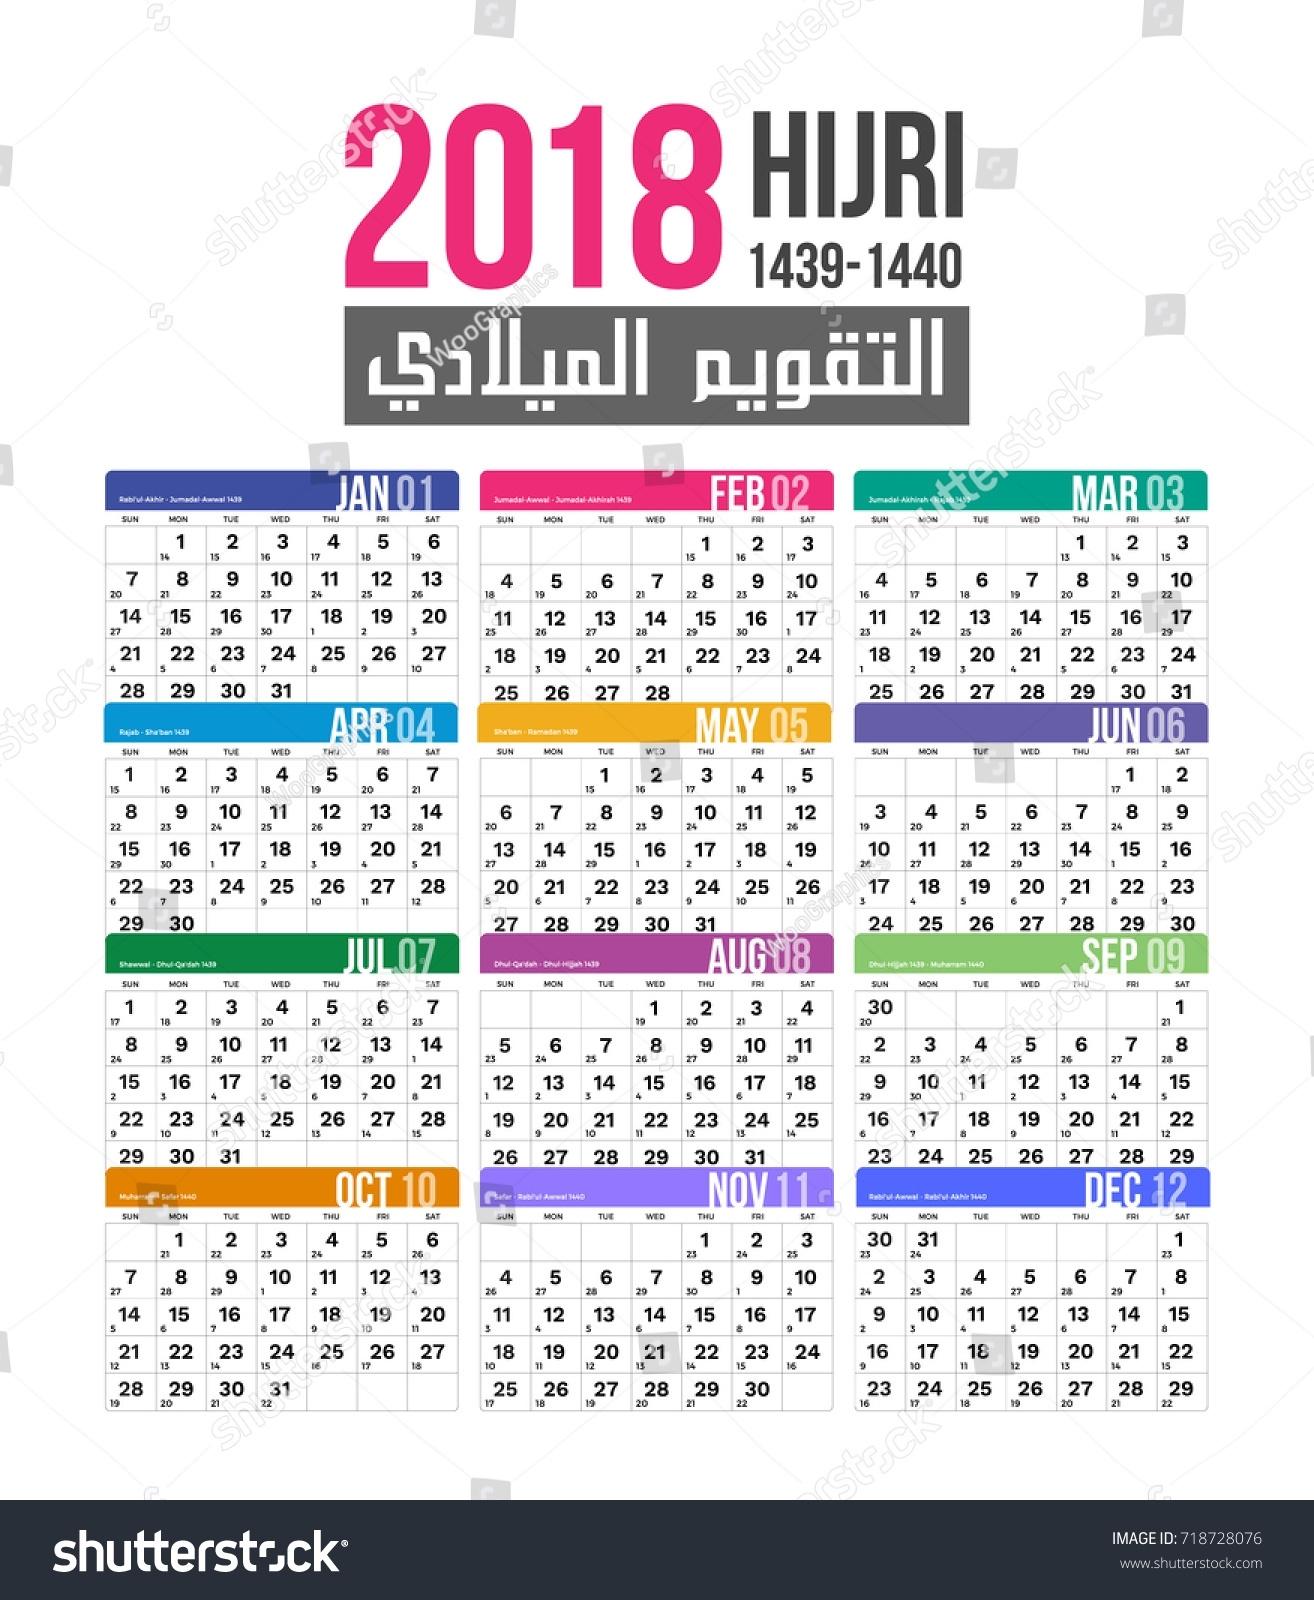 Islamic Calendar 2019 | 2018 Yearly Calendar throughout Islamic Calender In Saudi Arabia